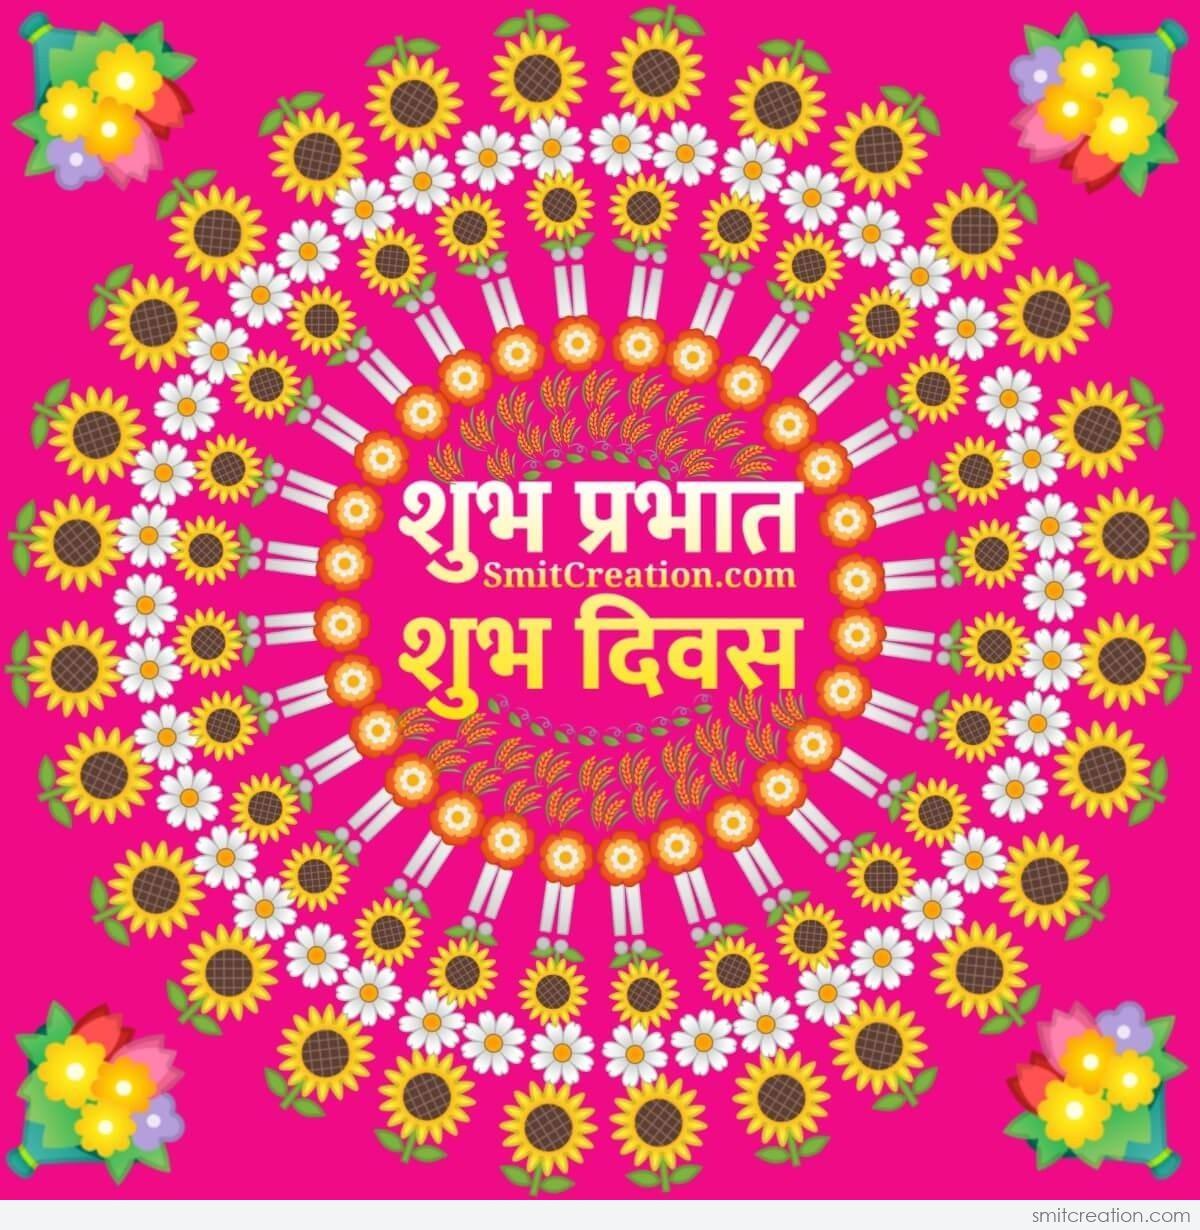 Shubh Prabhat Shubh Diwas Flower Mandala